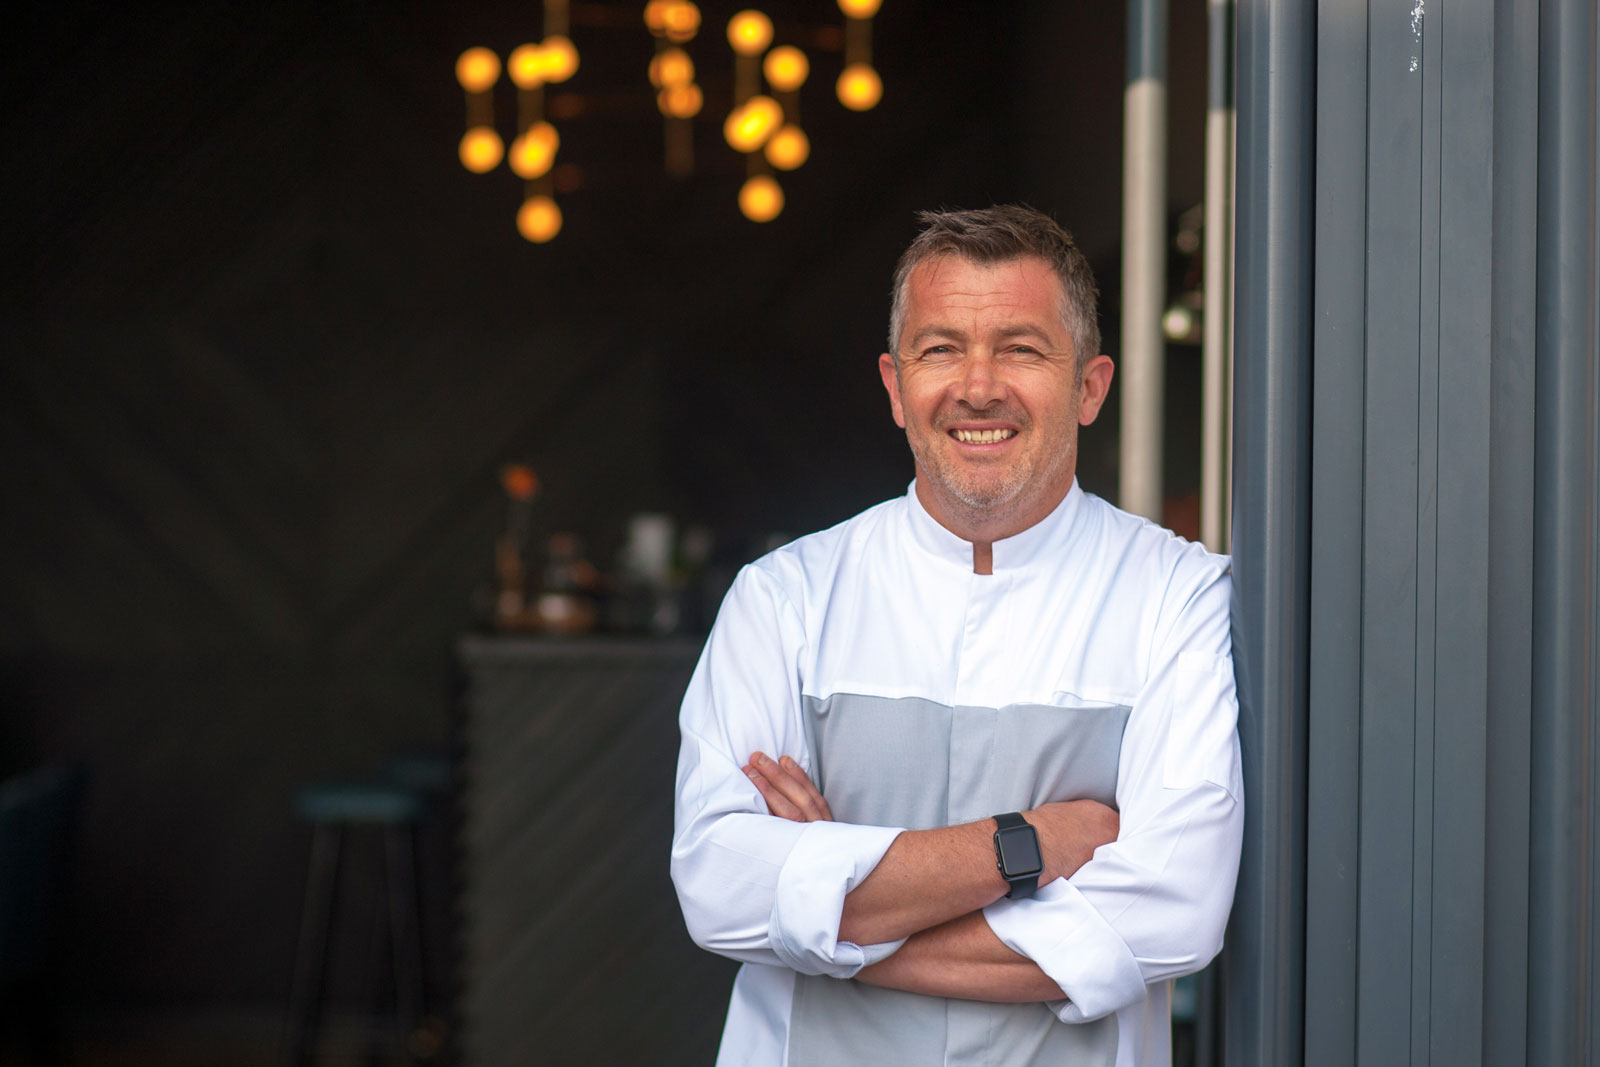 Alba Head Chef Grant Nethercott